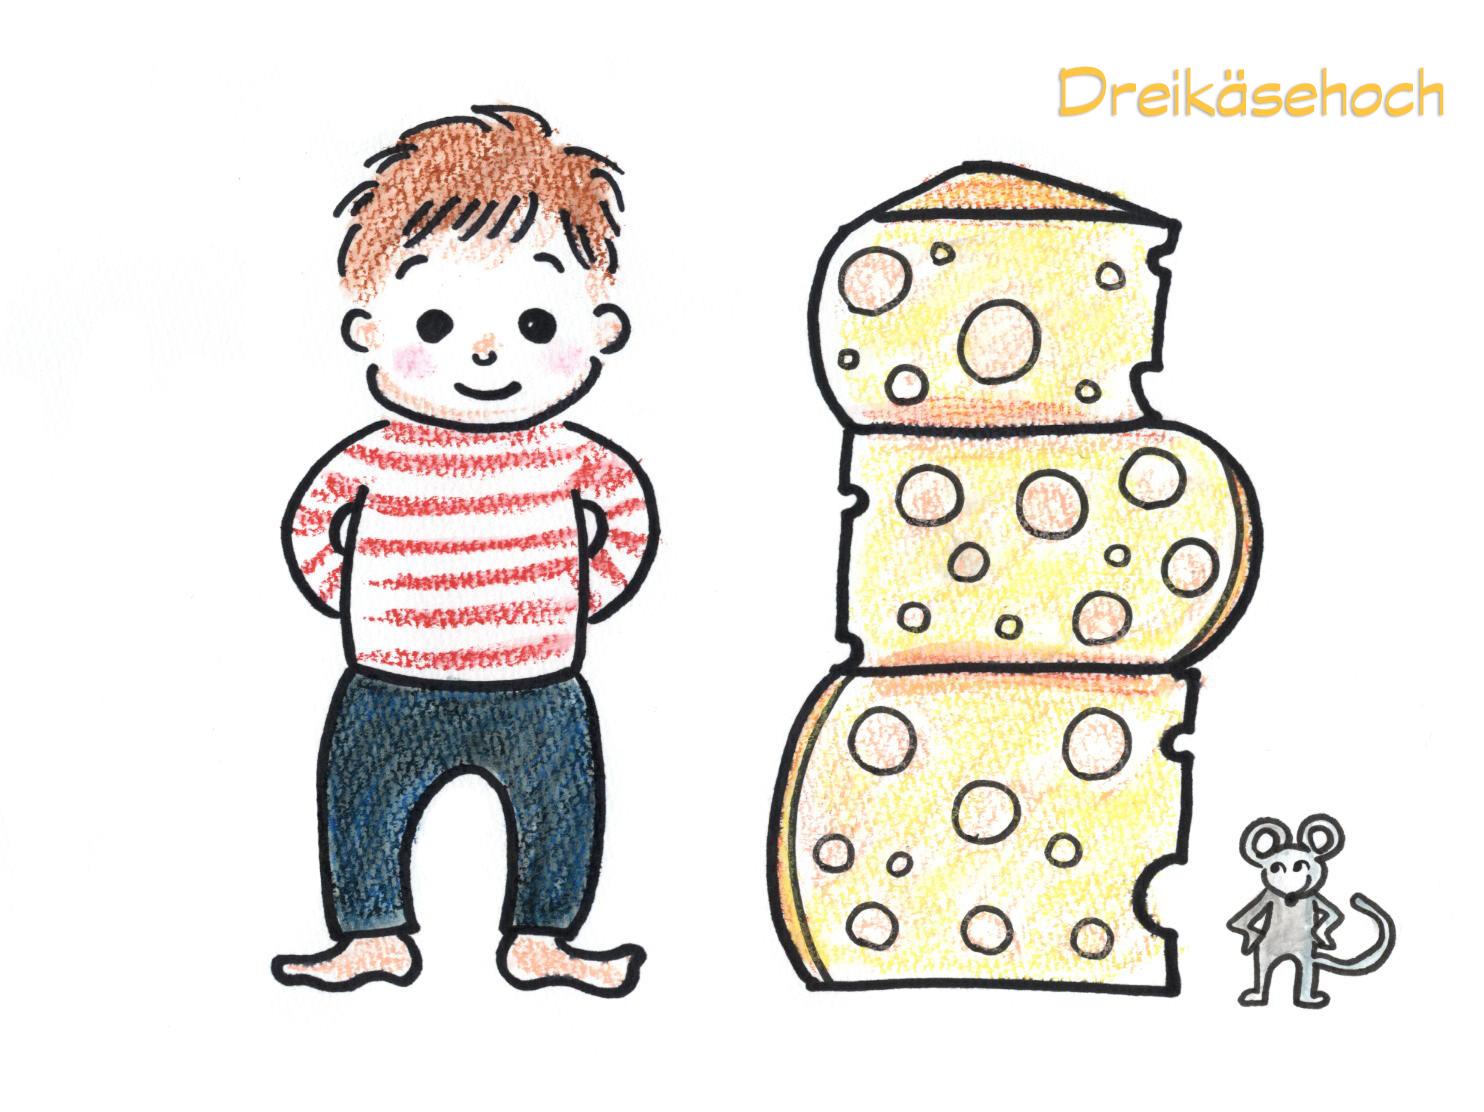 Dreikäsehochのコピー